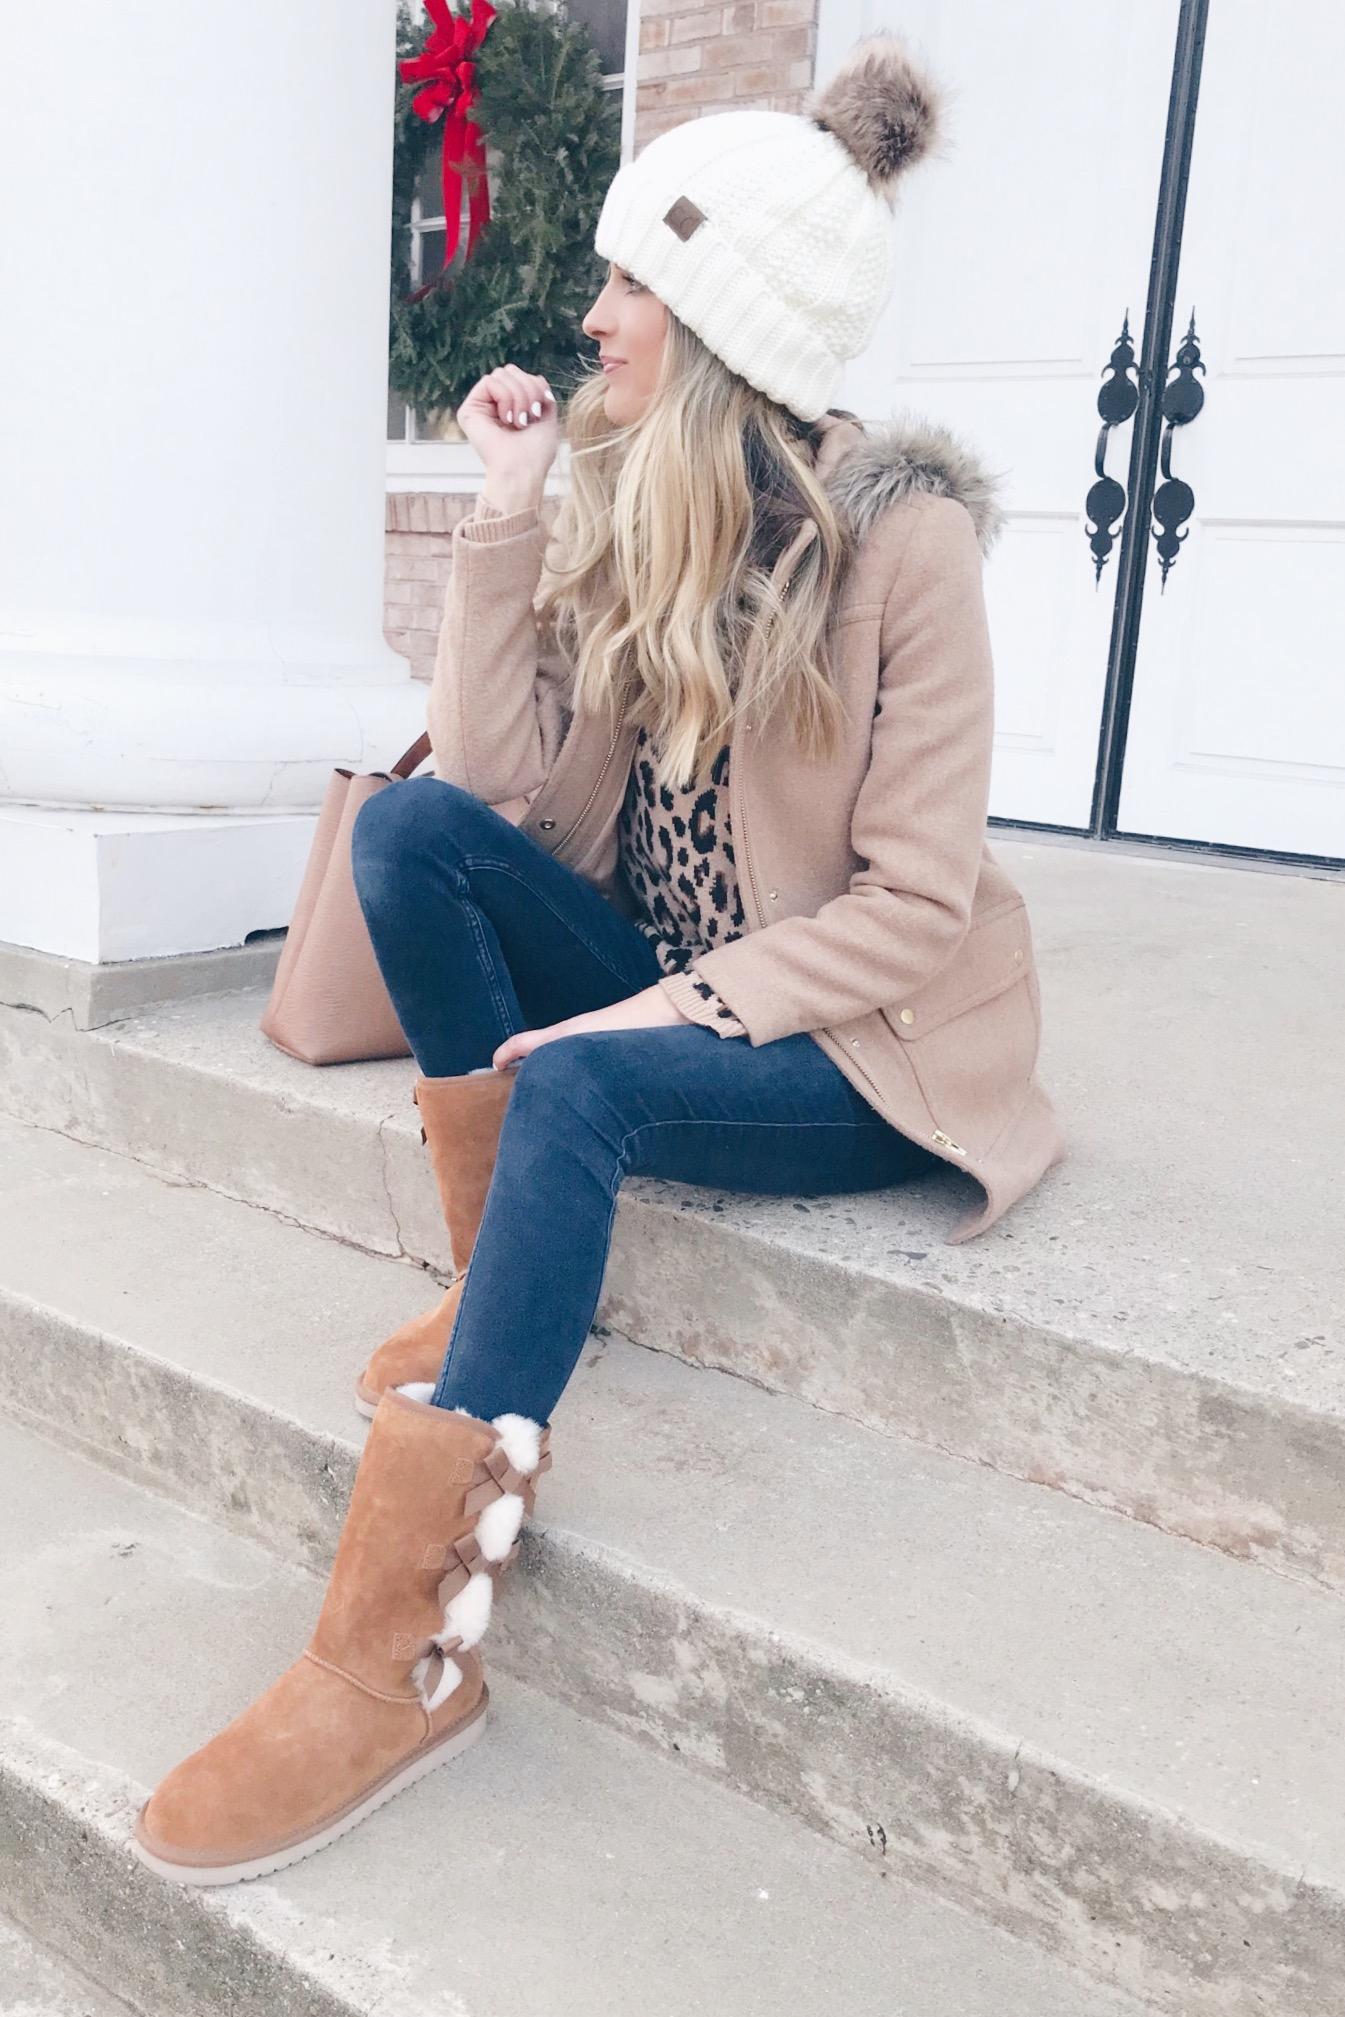 pinteresting plans fashion blog in women's boots with bows x koolaburra